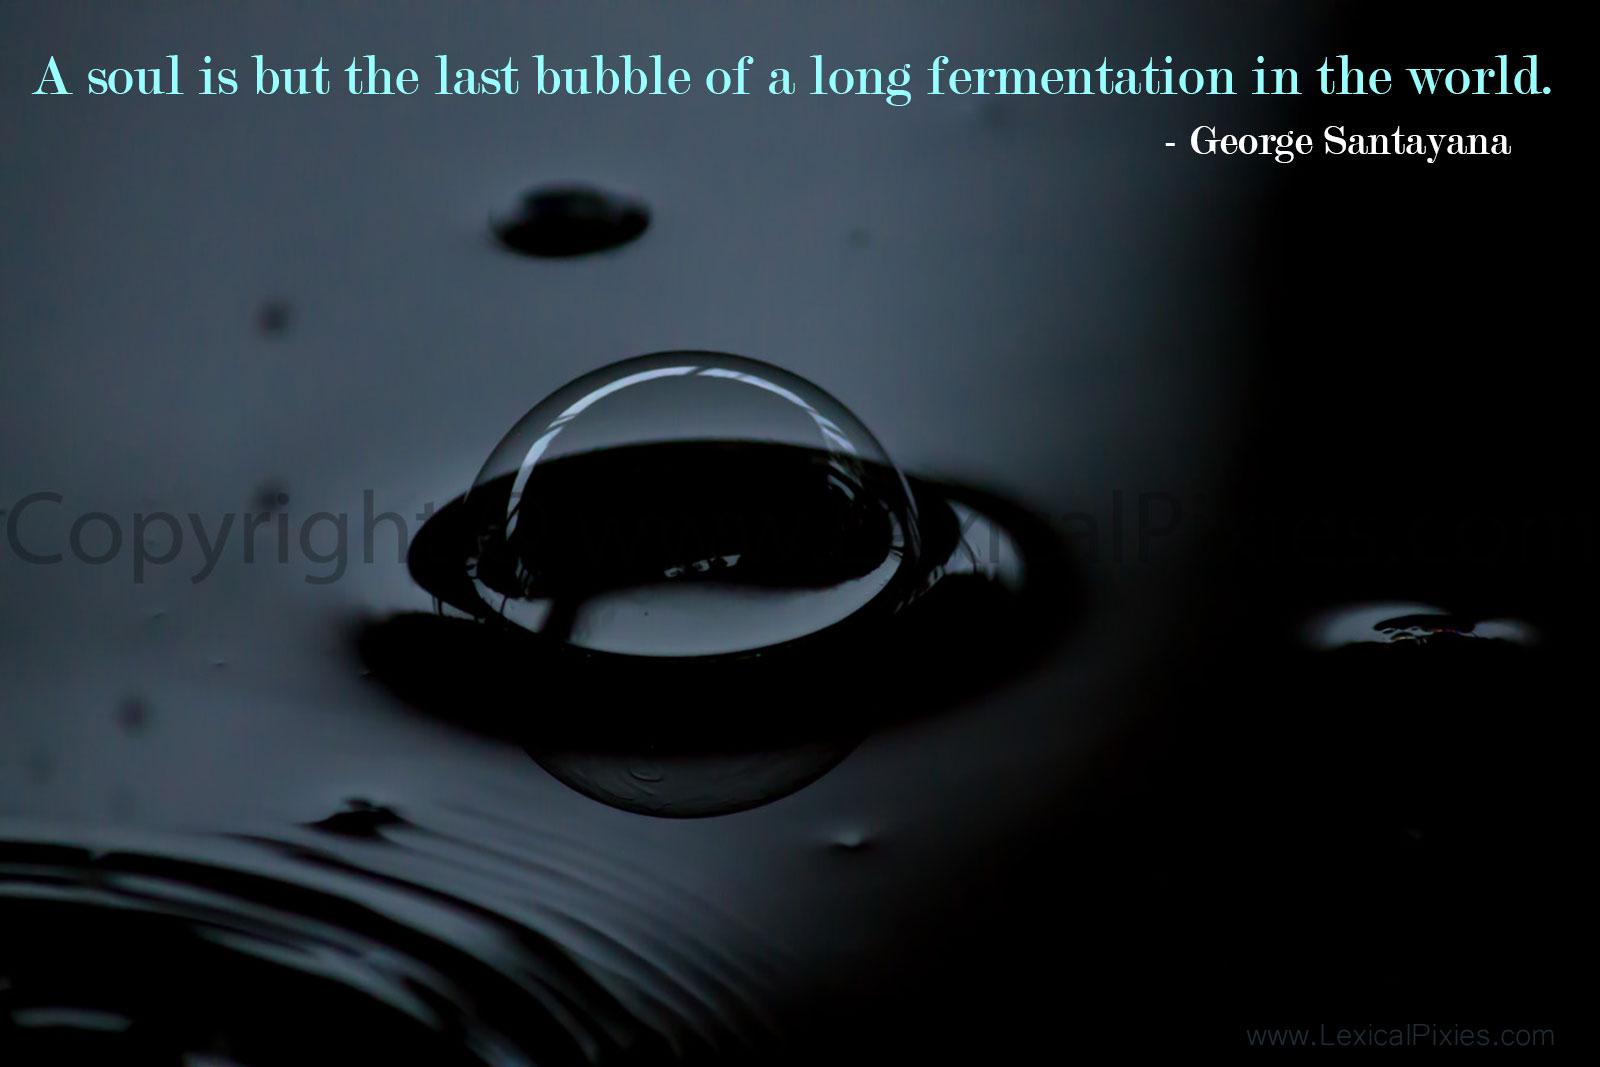 Cute Bubble Quotes. QuotesGram